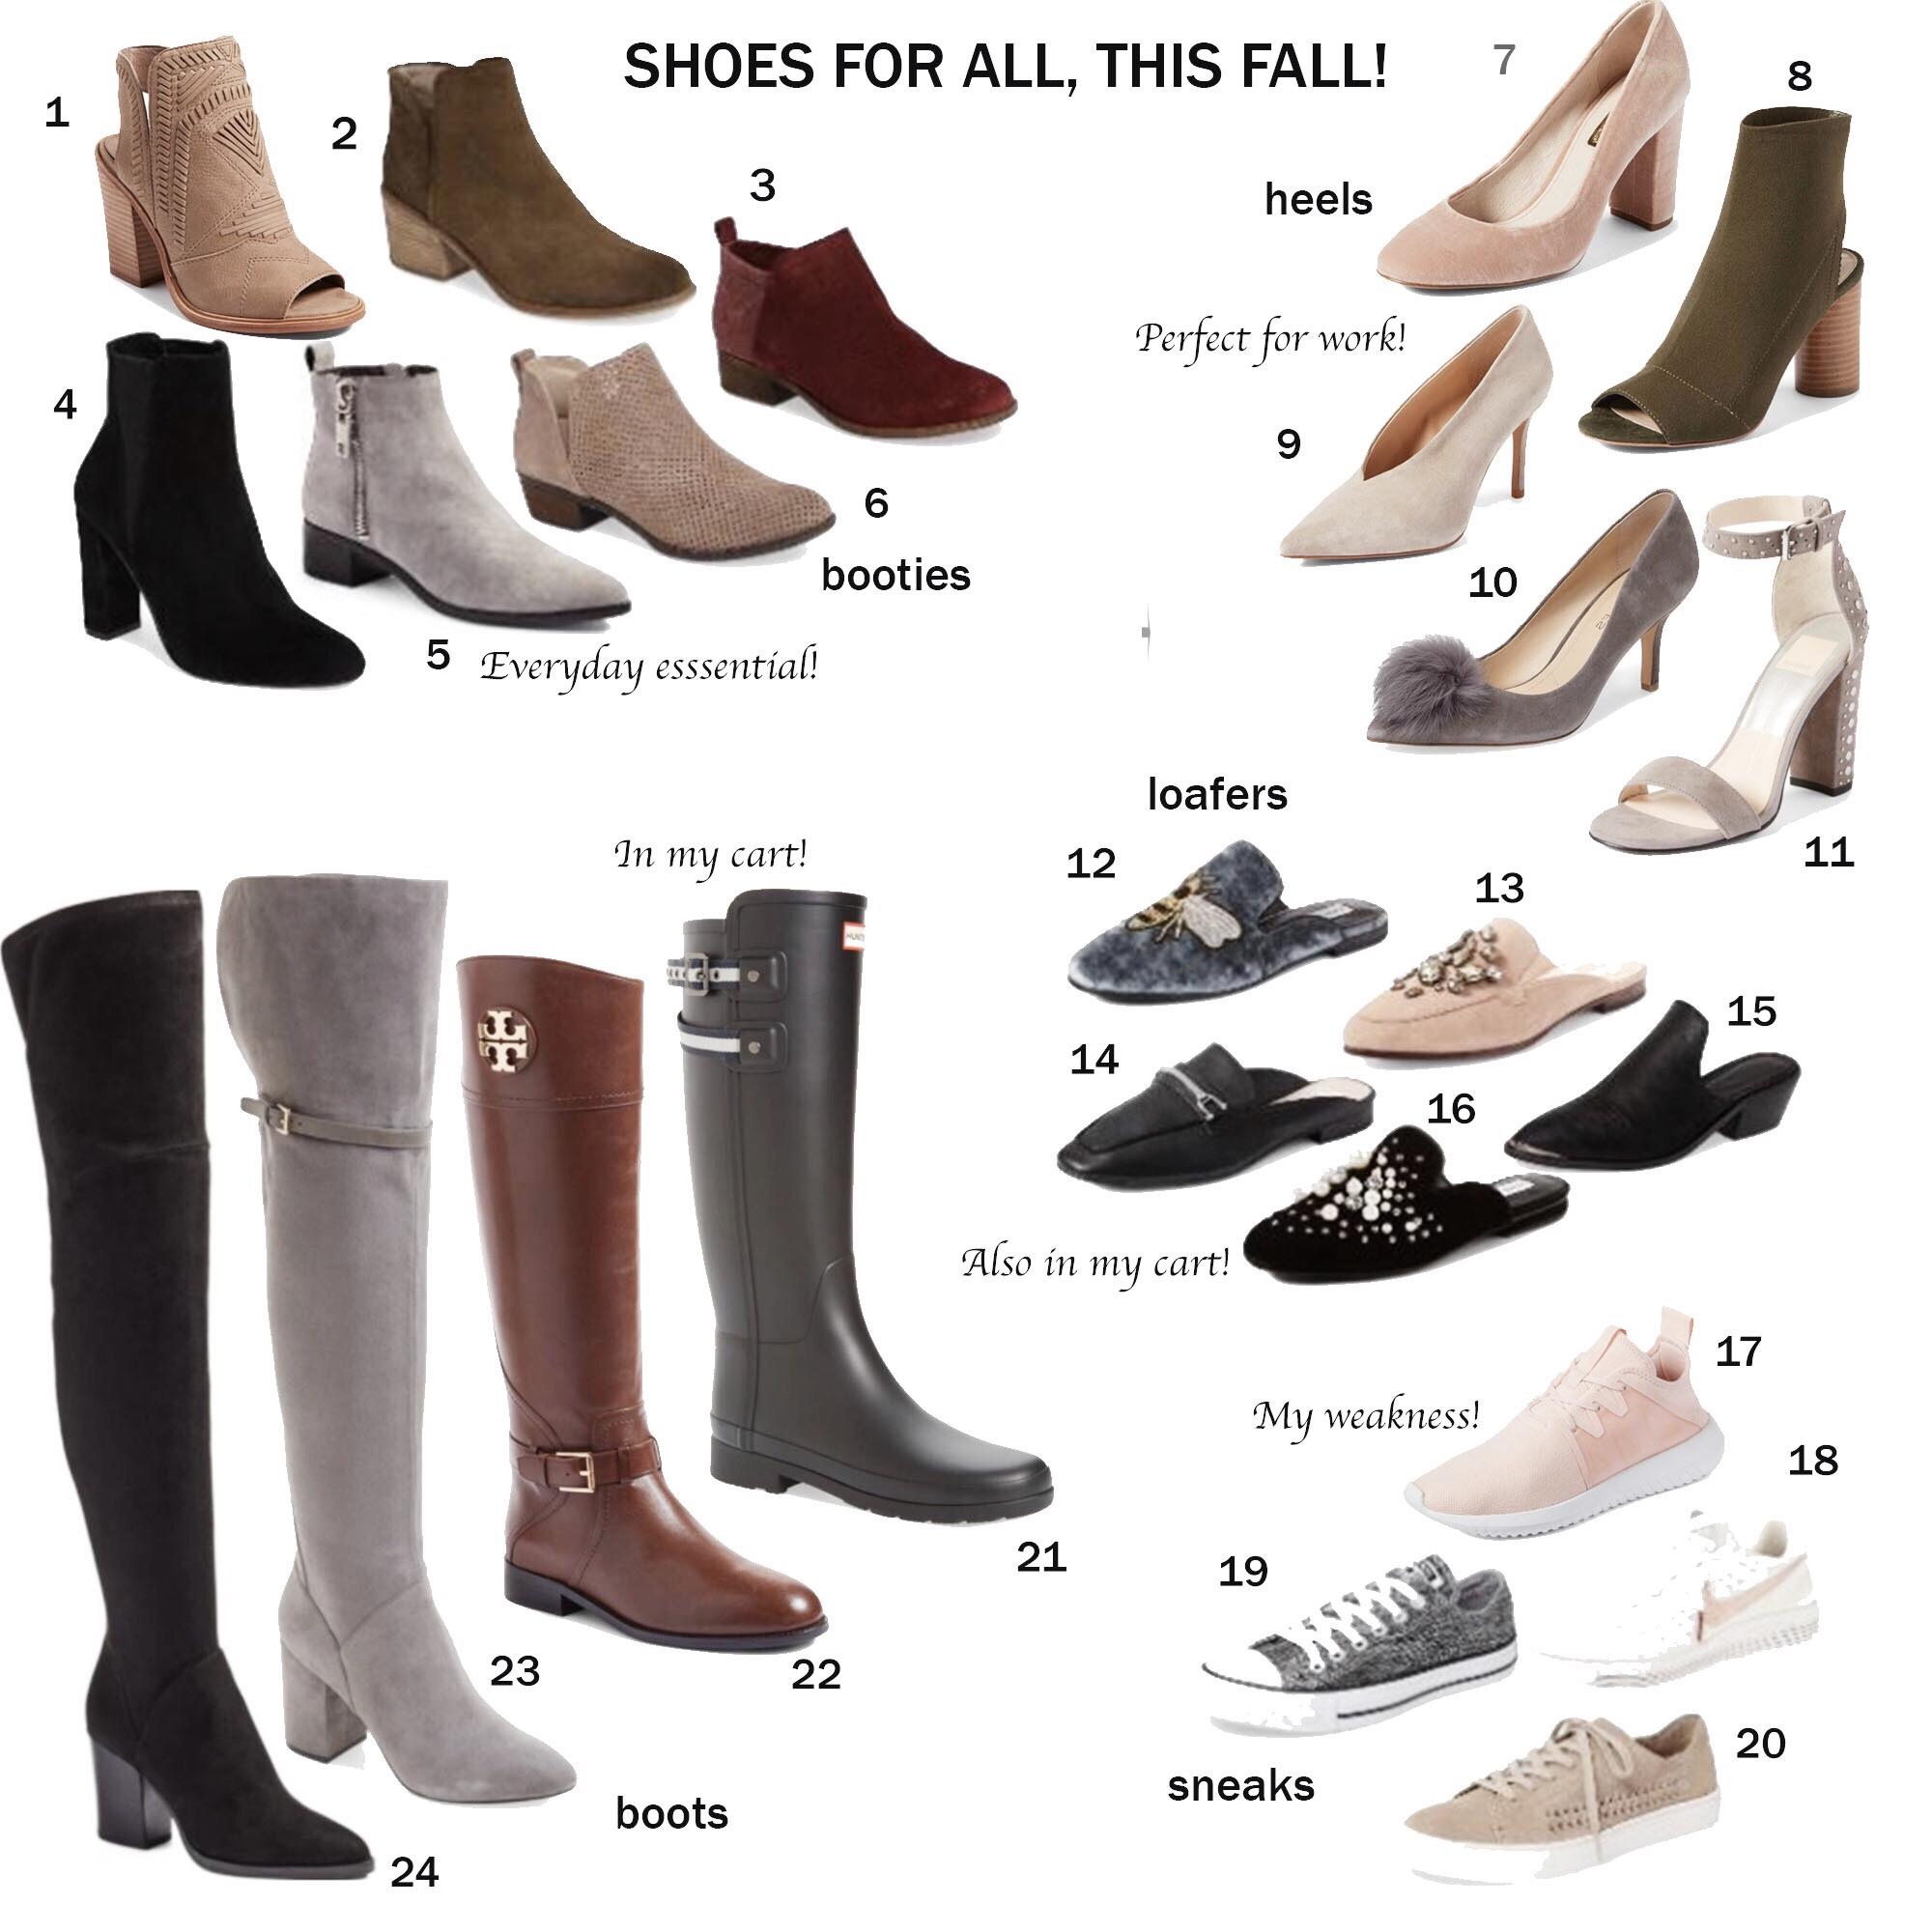 NORDSTROM ANNIVERSARY SALE: Breakdown + Shoes!